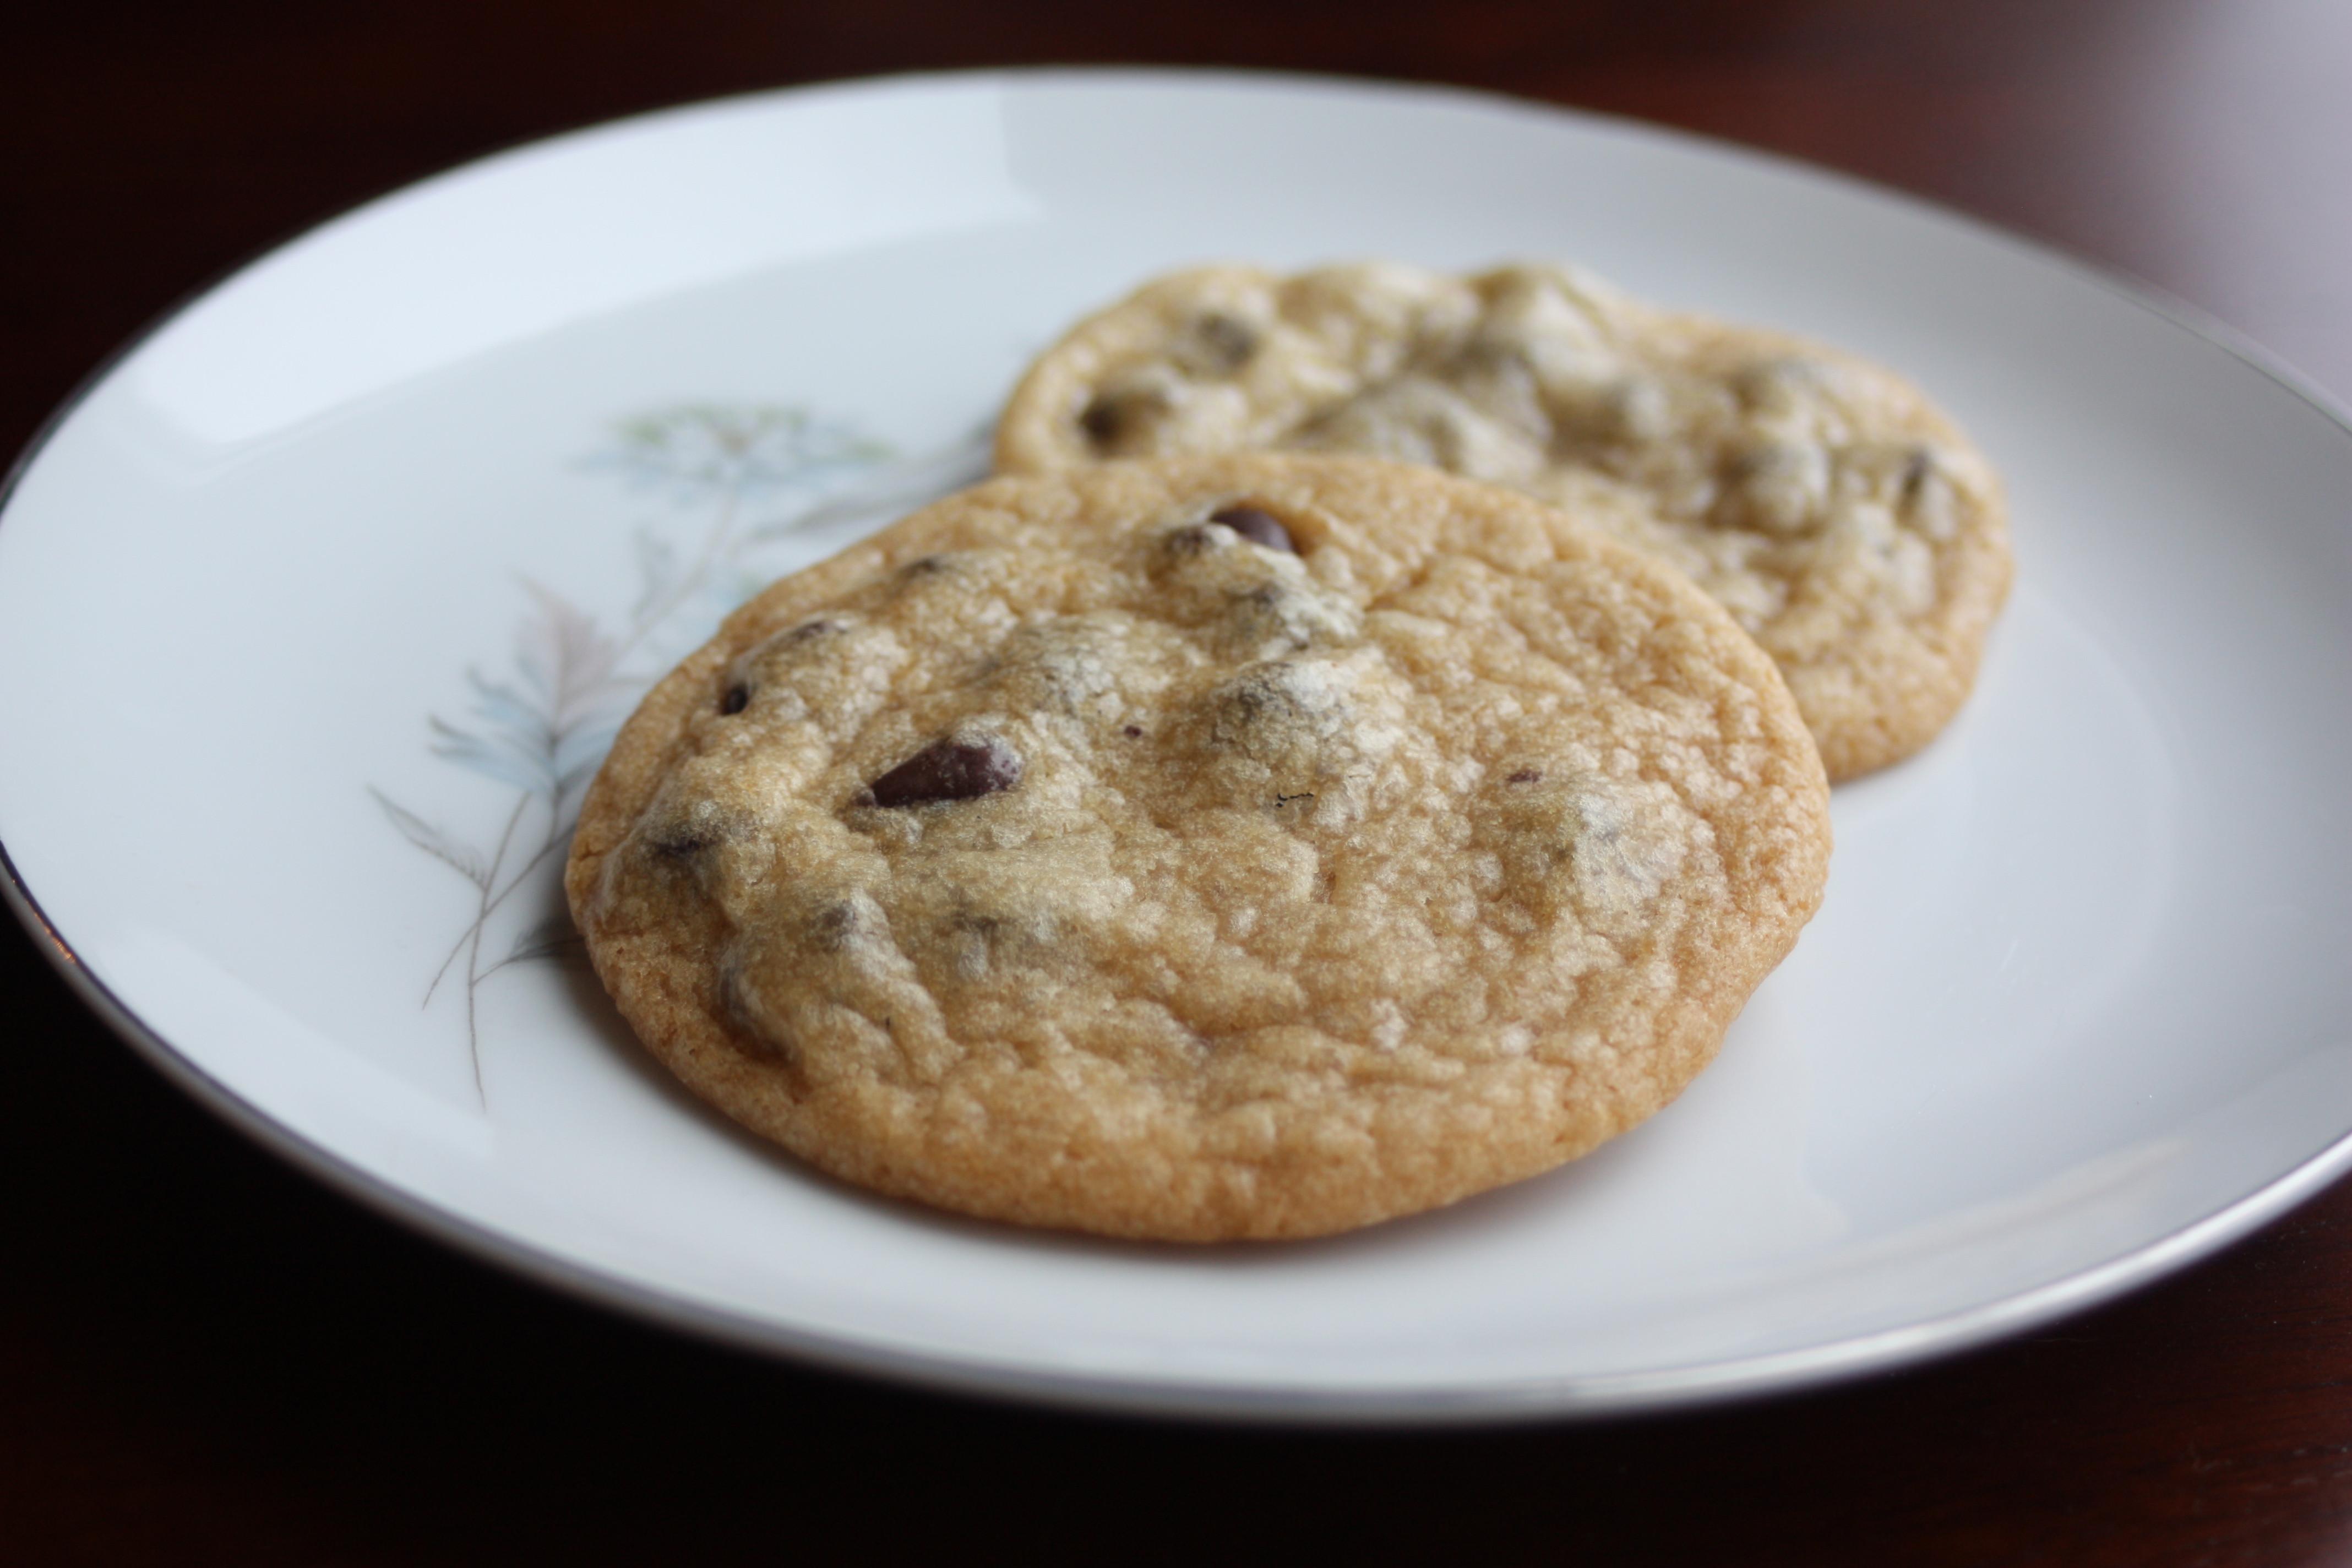 Vegan Chocolate Chip Cookies Recipe  Vegan Chocolate Chip Cookies Recipe Around the World in